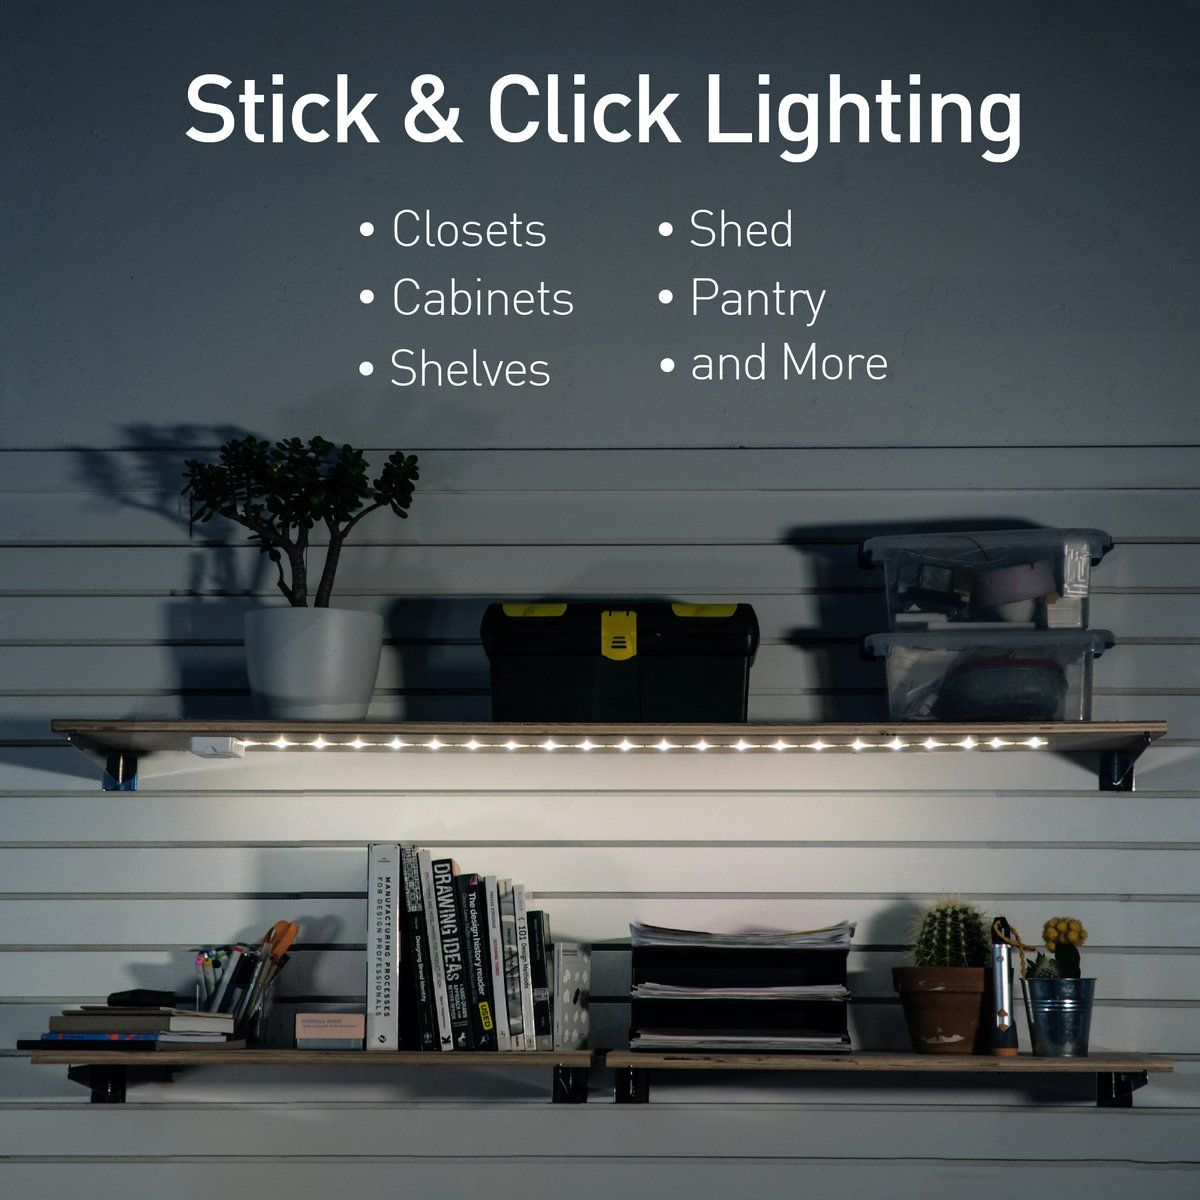 luminoodle click led light for closets